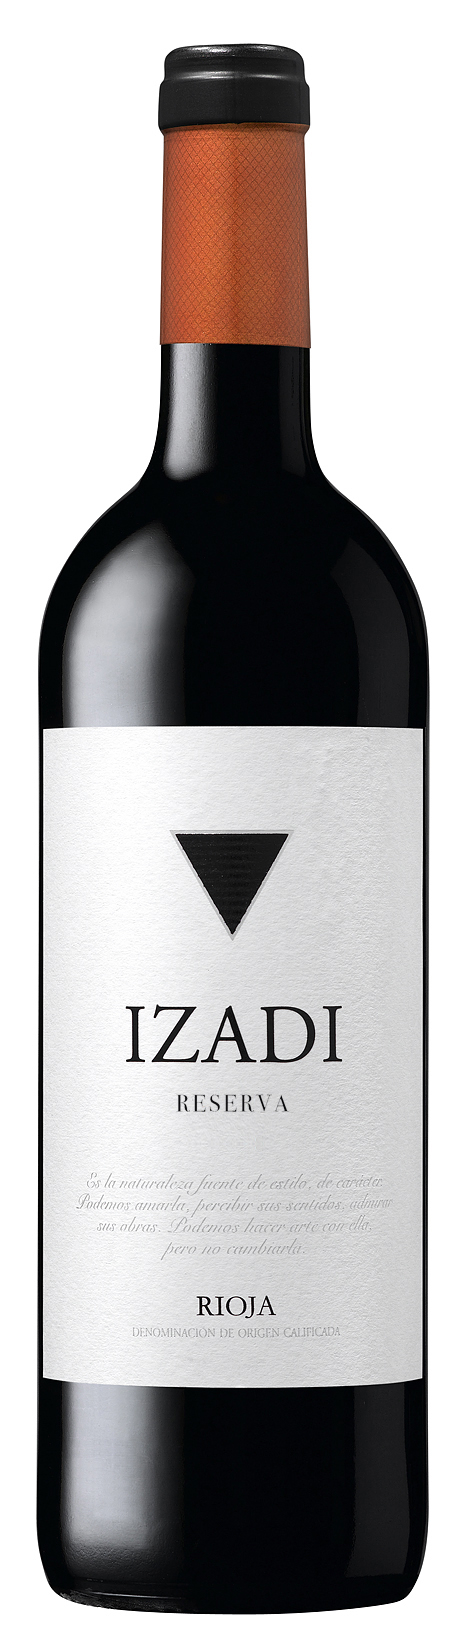 Izadi, Rioja Reserva 2010